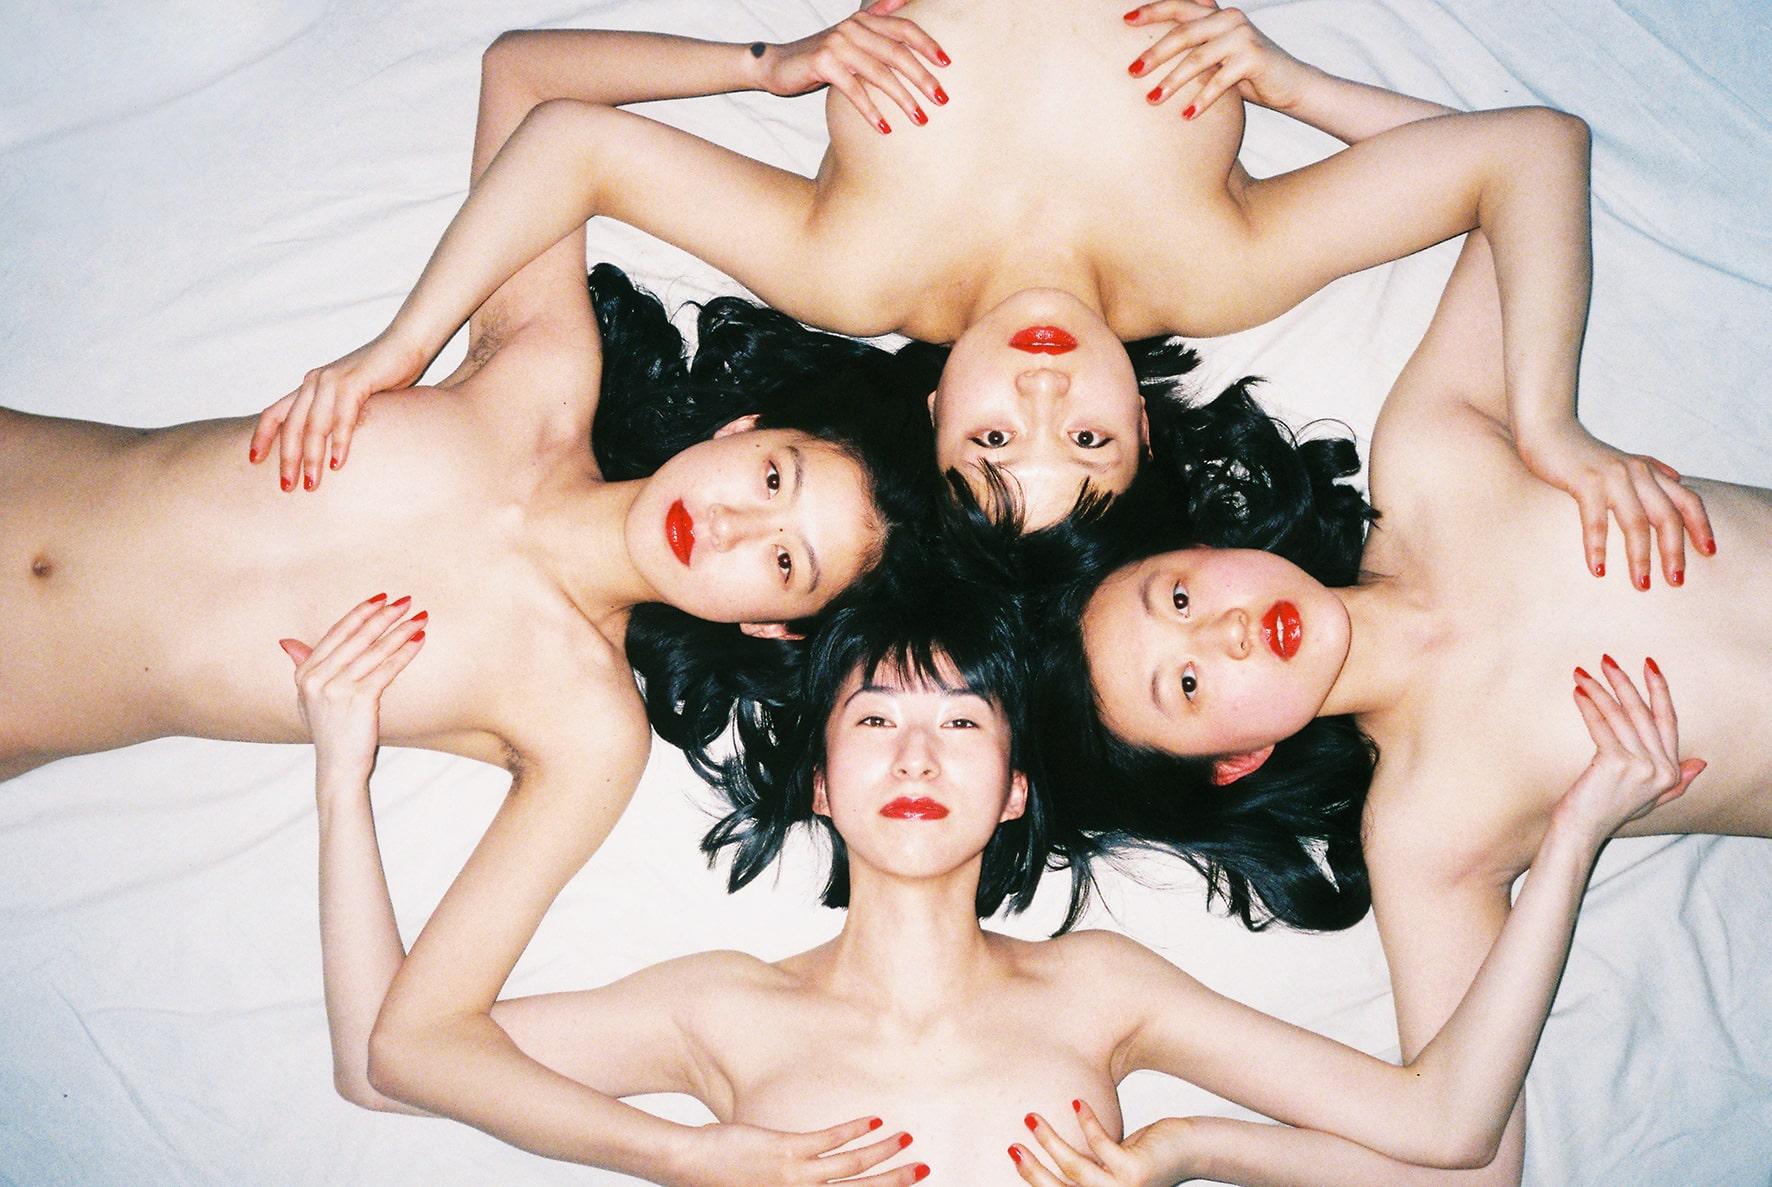 2014_05 (2014).Impression jet d'encre. Ren Hang, courtesy of Galerie Paris-Beijing.